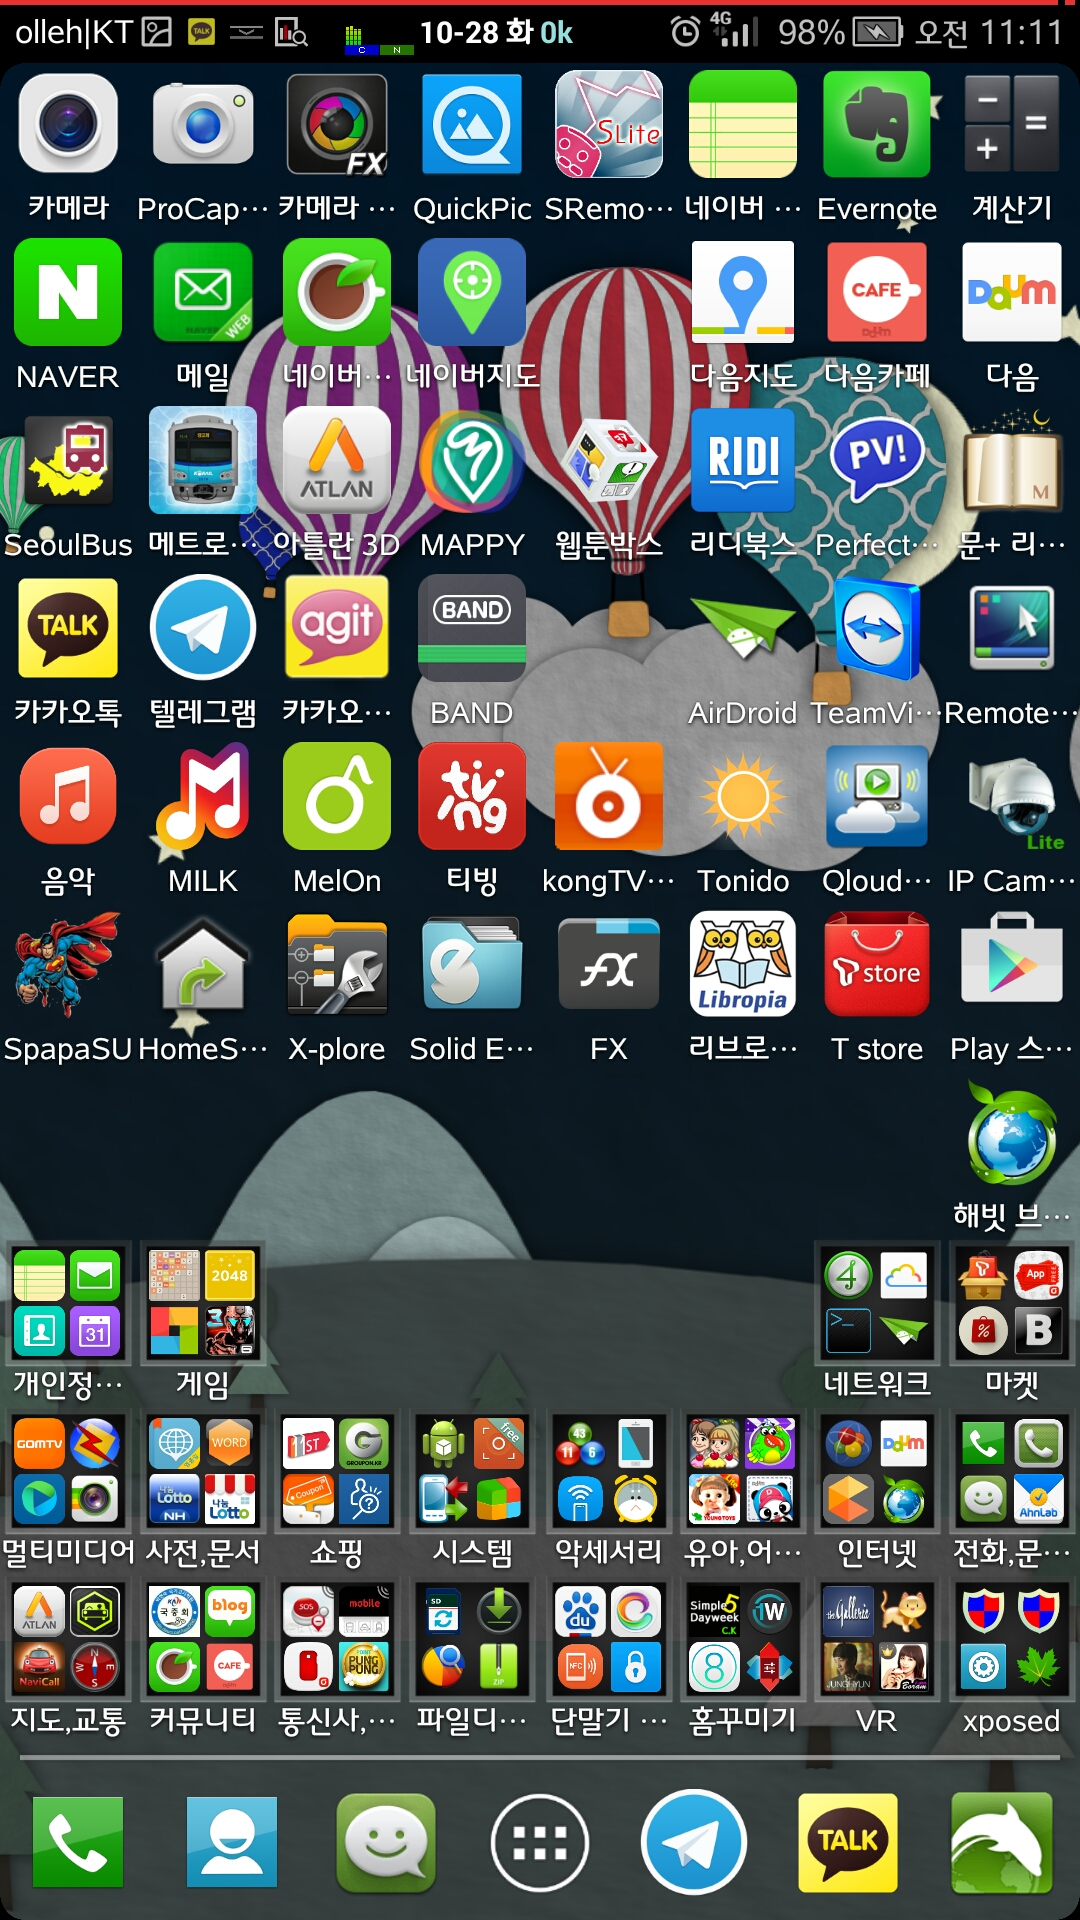 Screenshot_2014-10-28-11-11-42.jpeg